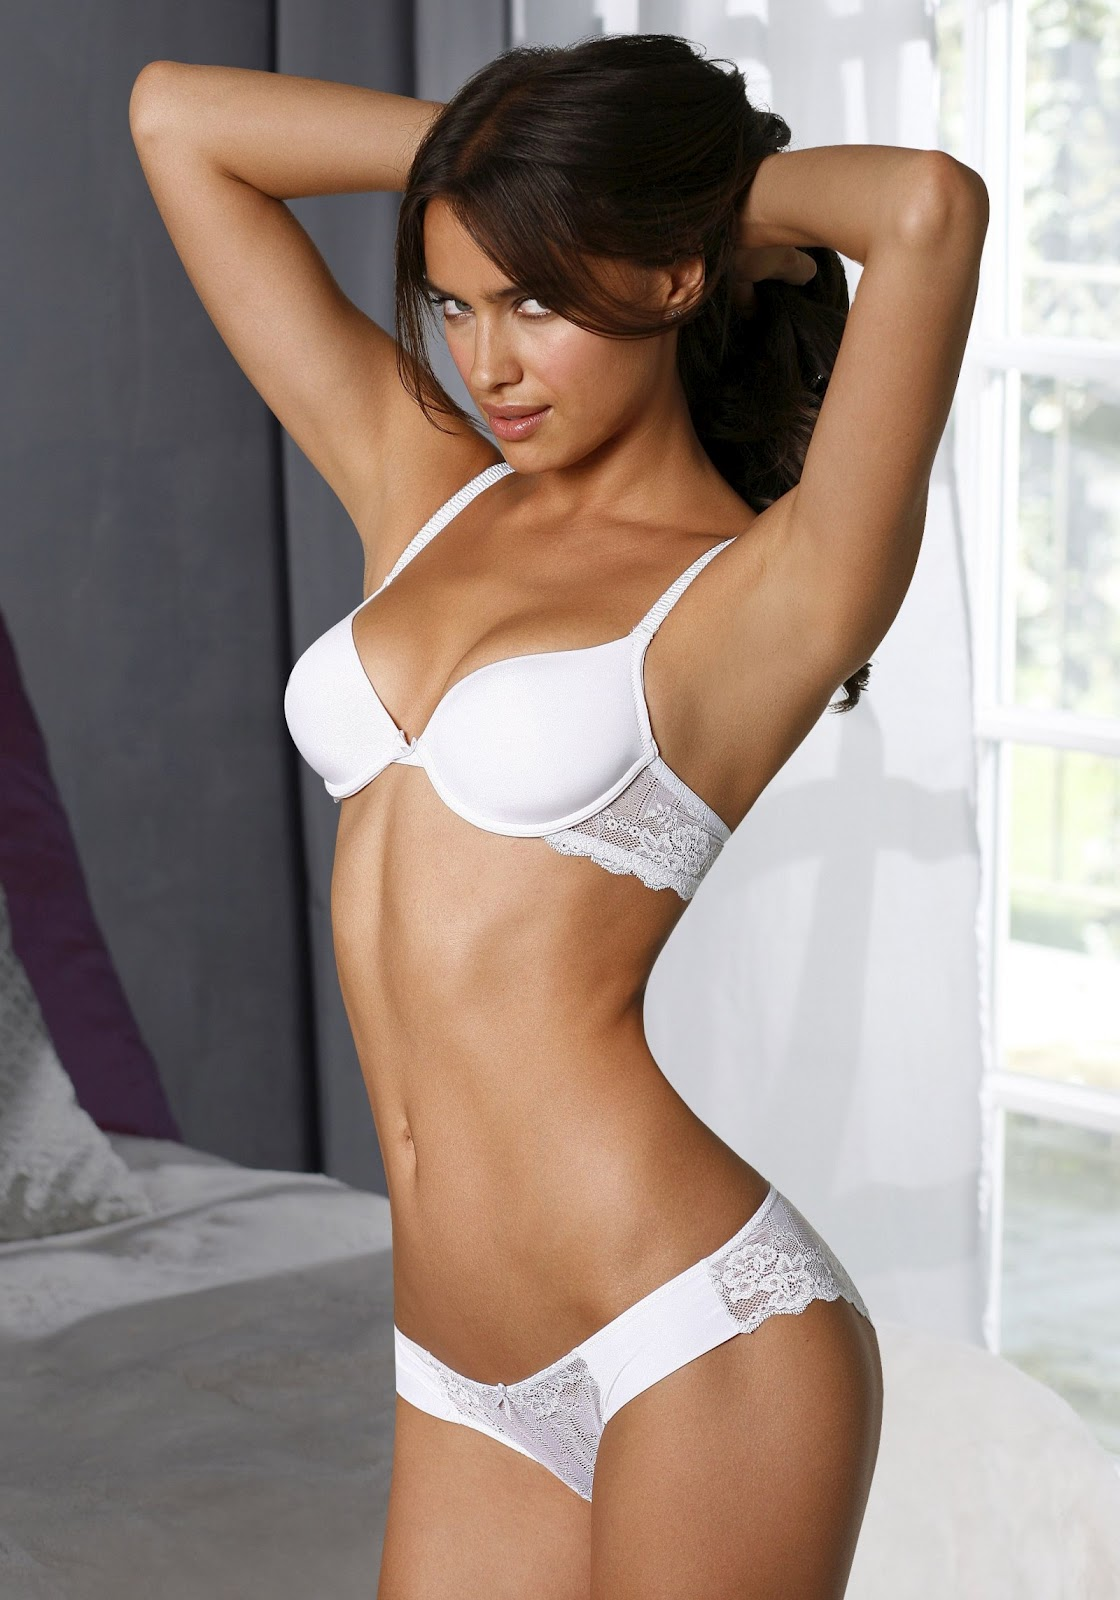 http://3.bp.blogspot.com/-aH9NwVy8g0Y/T1in2hLWxlI/AAAAAAAAH9E/xqF5893Ck64/s1600/irina-shayk-lingerie-003.jpg